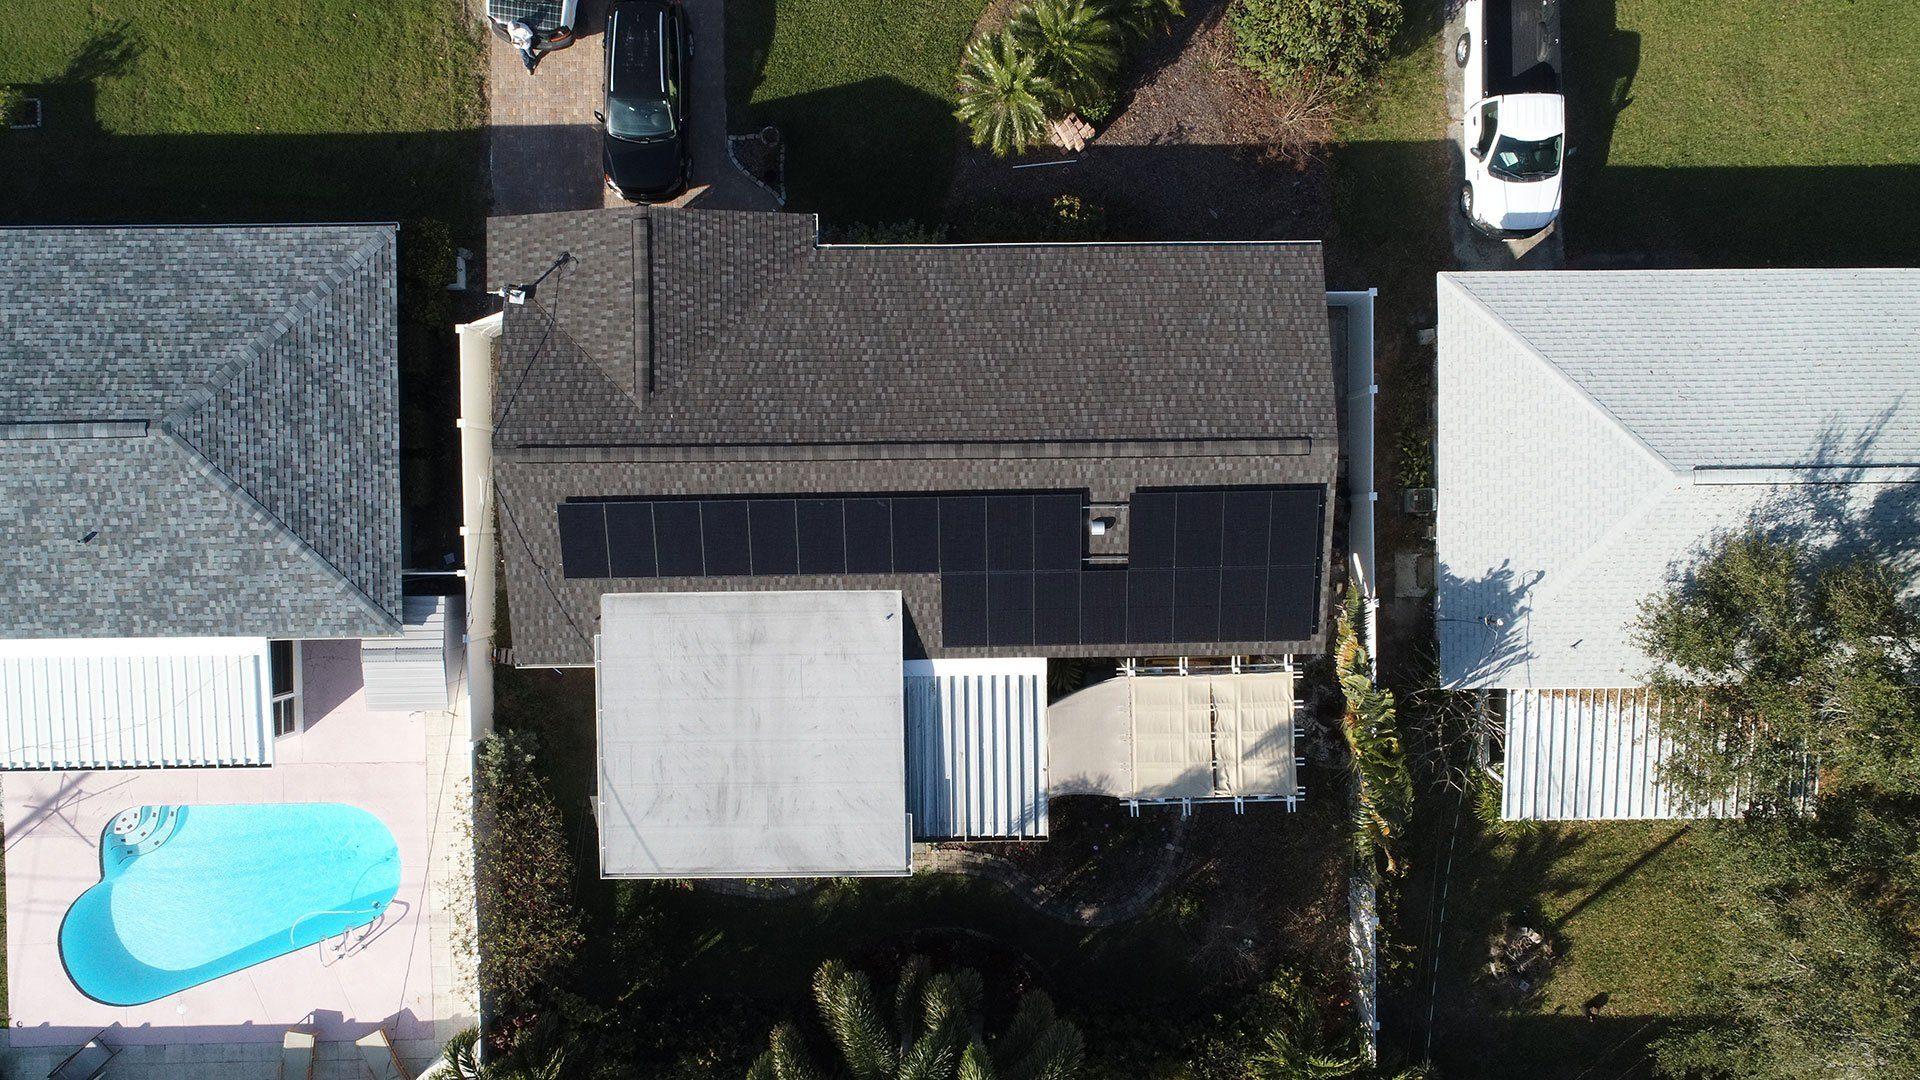 Overhead View of solar installation in Seminole, FL